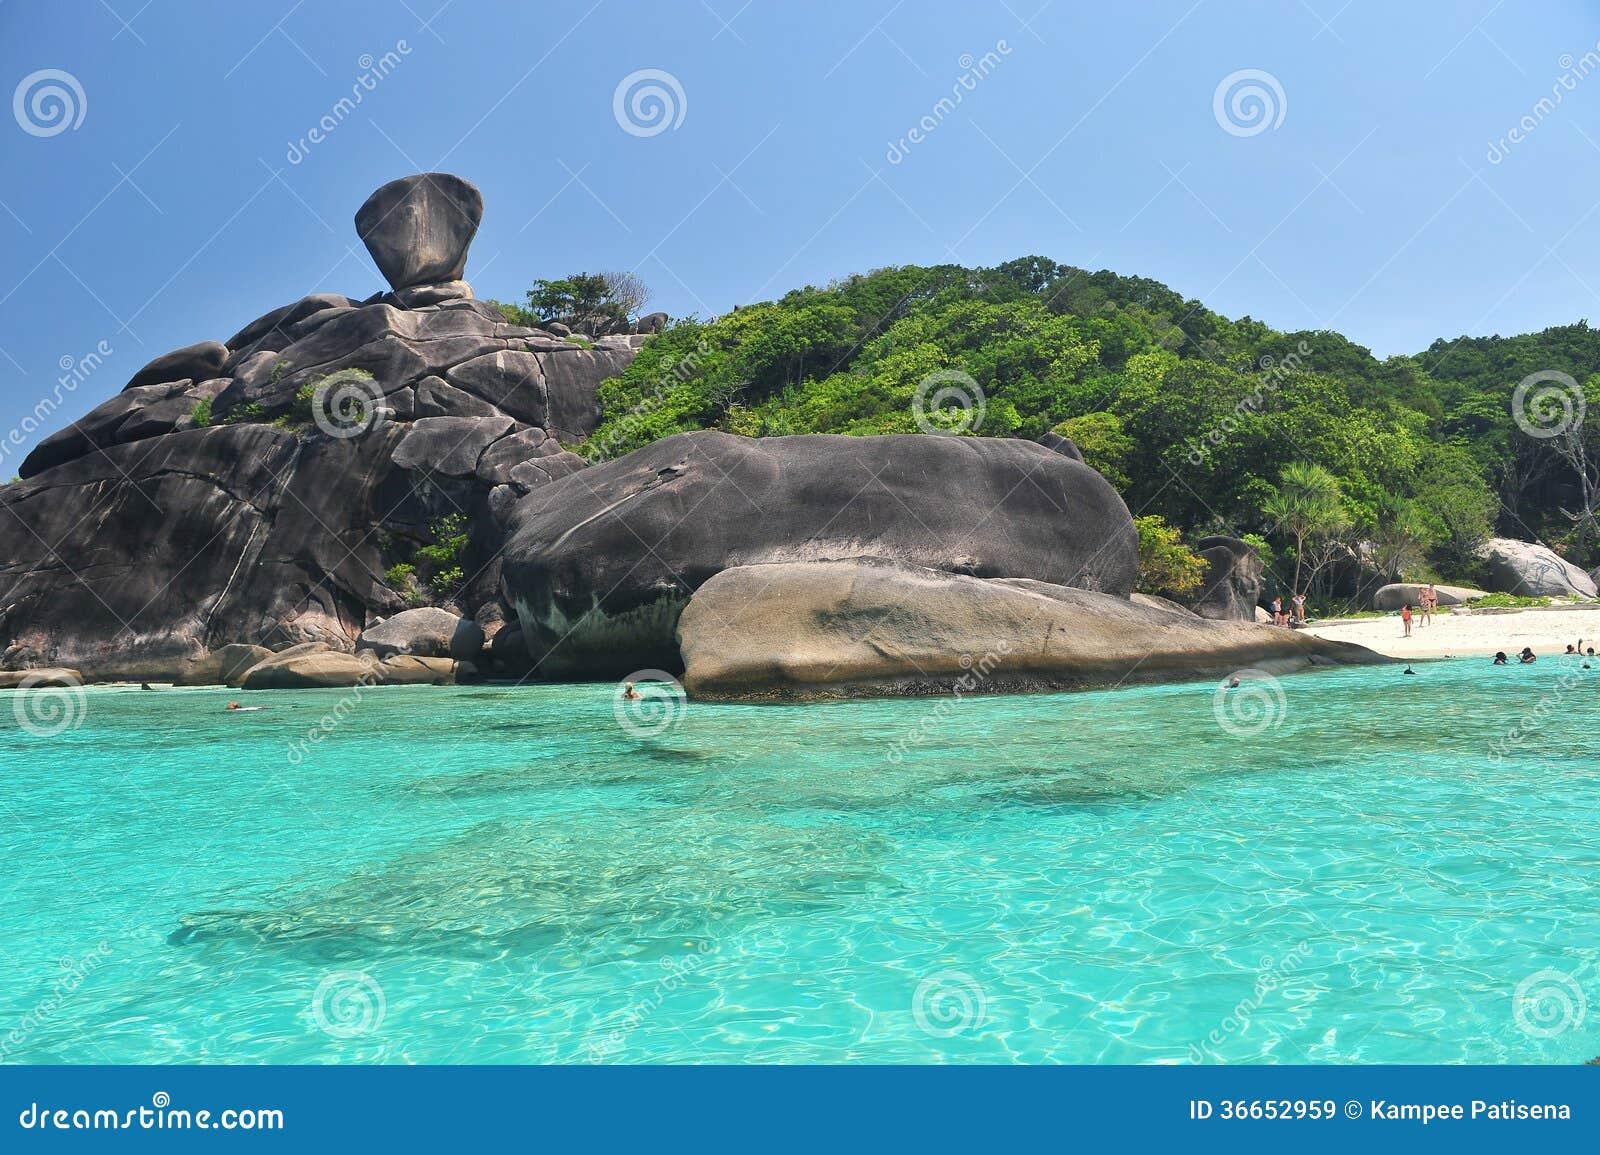 SIMILAN, PHANG NGA, THAILAND Editorial Stock Image - Image: 36652959